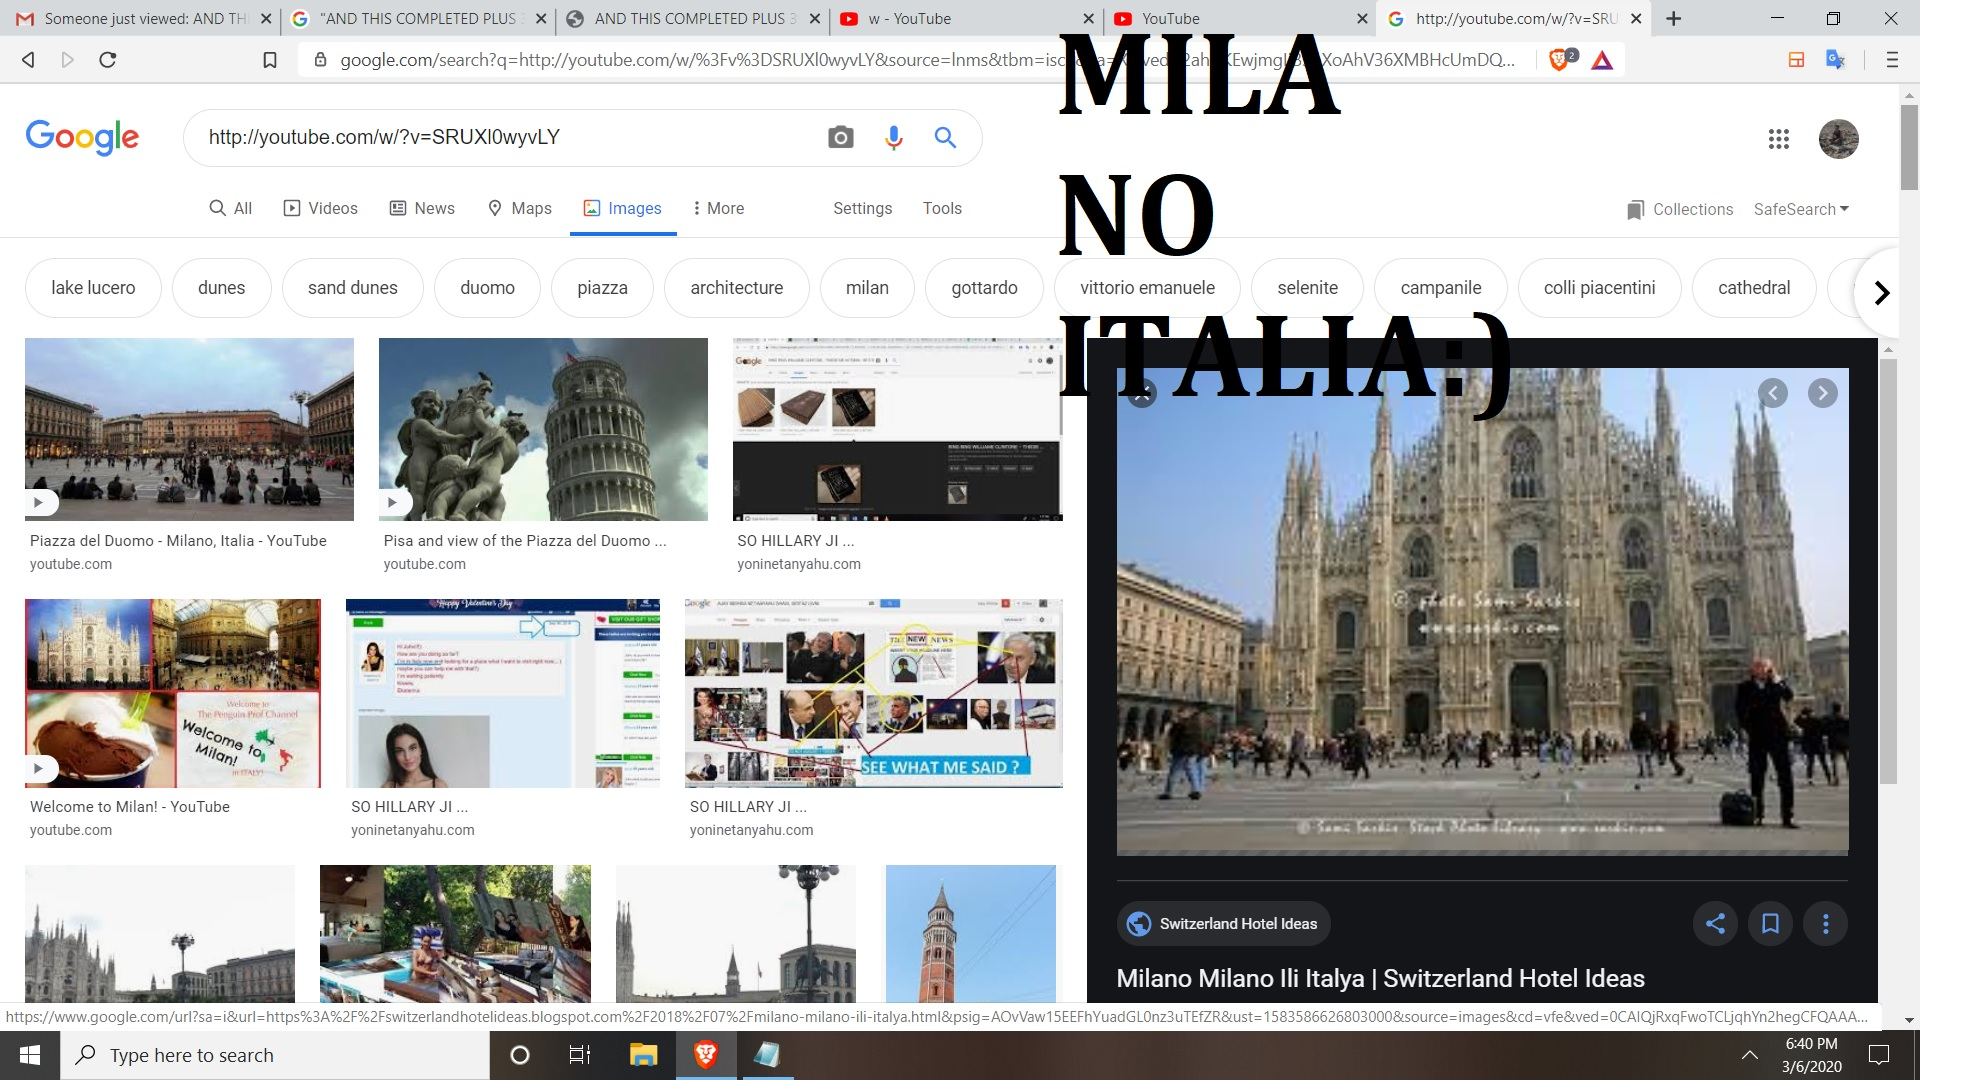 HELLO MILANO ITALIA